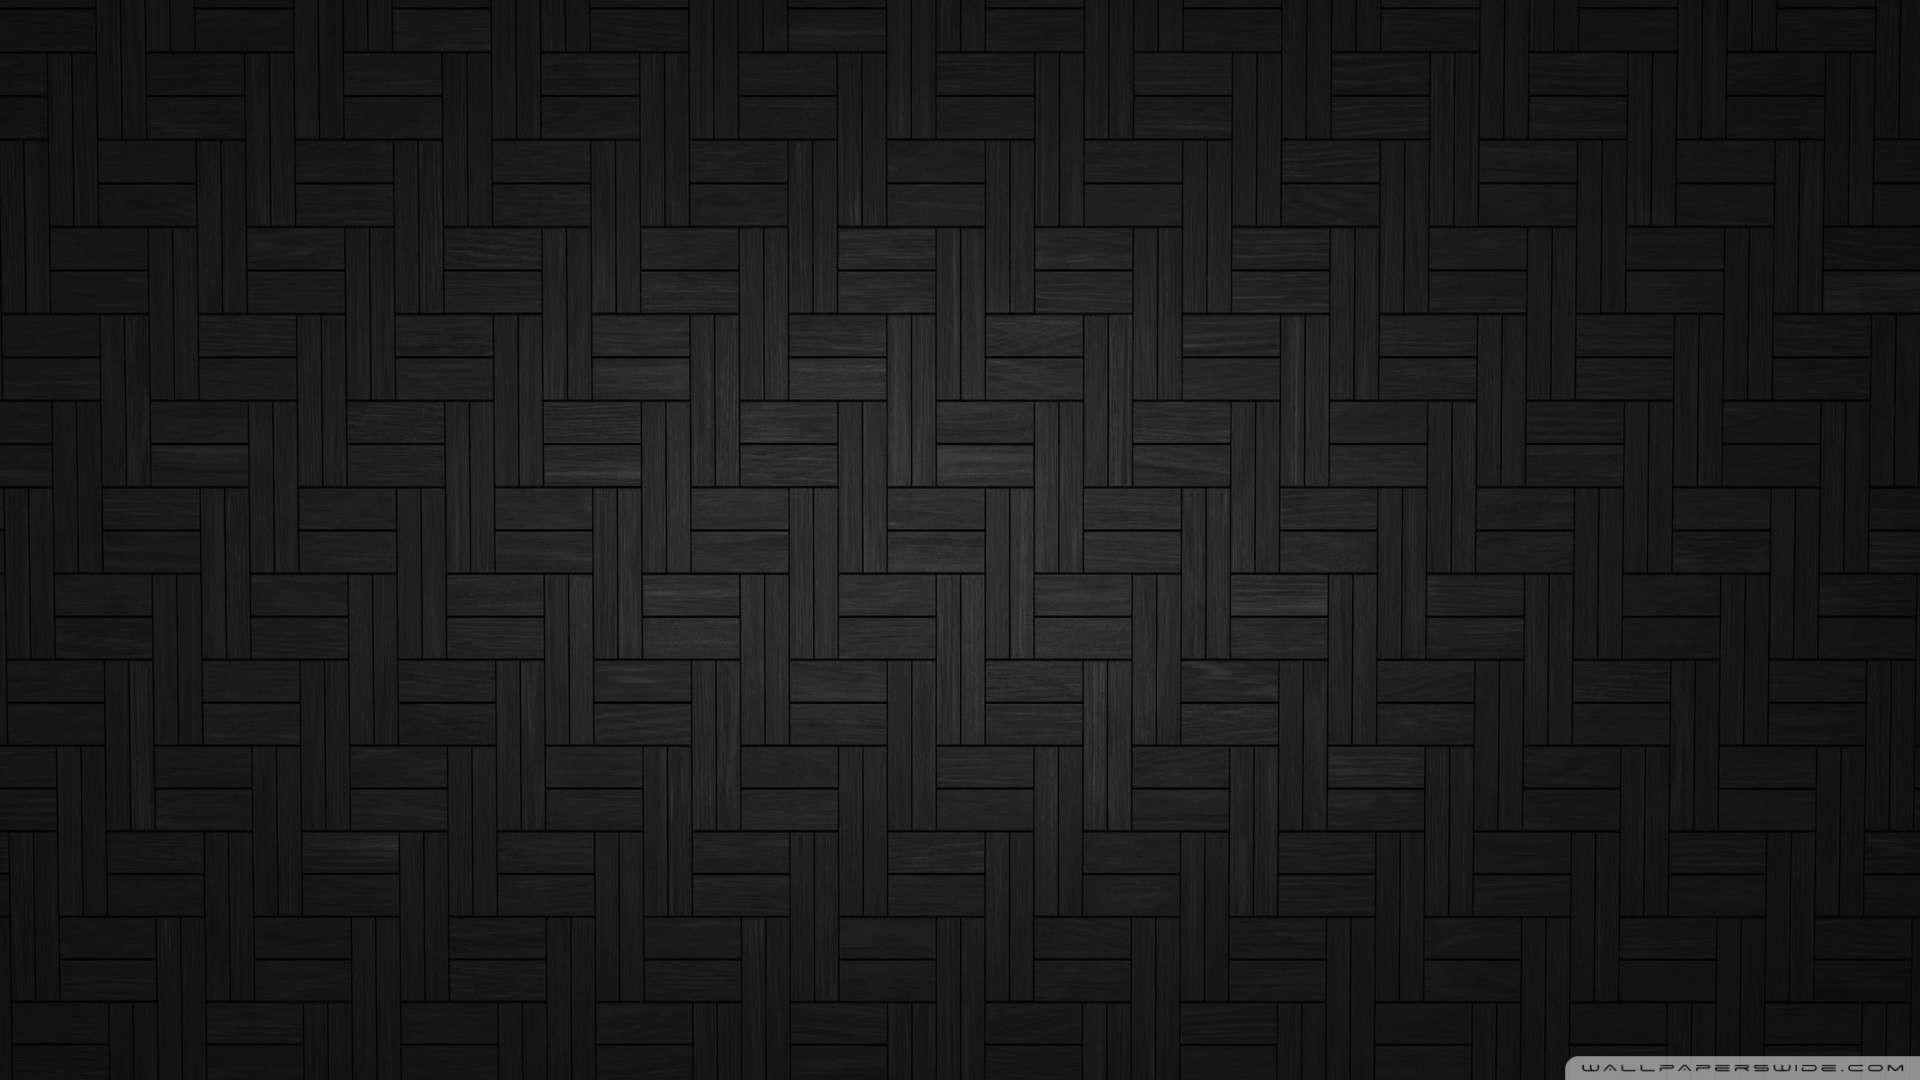 1920x1080 Wallpaper Black Texture 3 1080p HD Upload At December 31